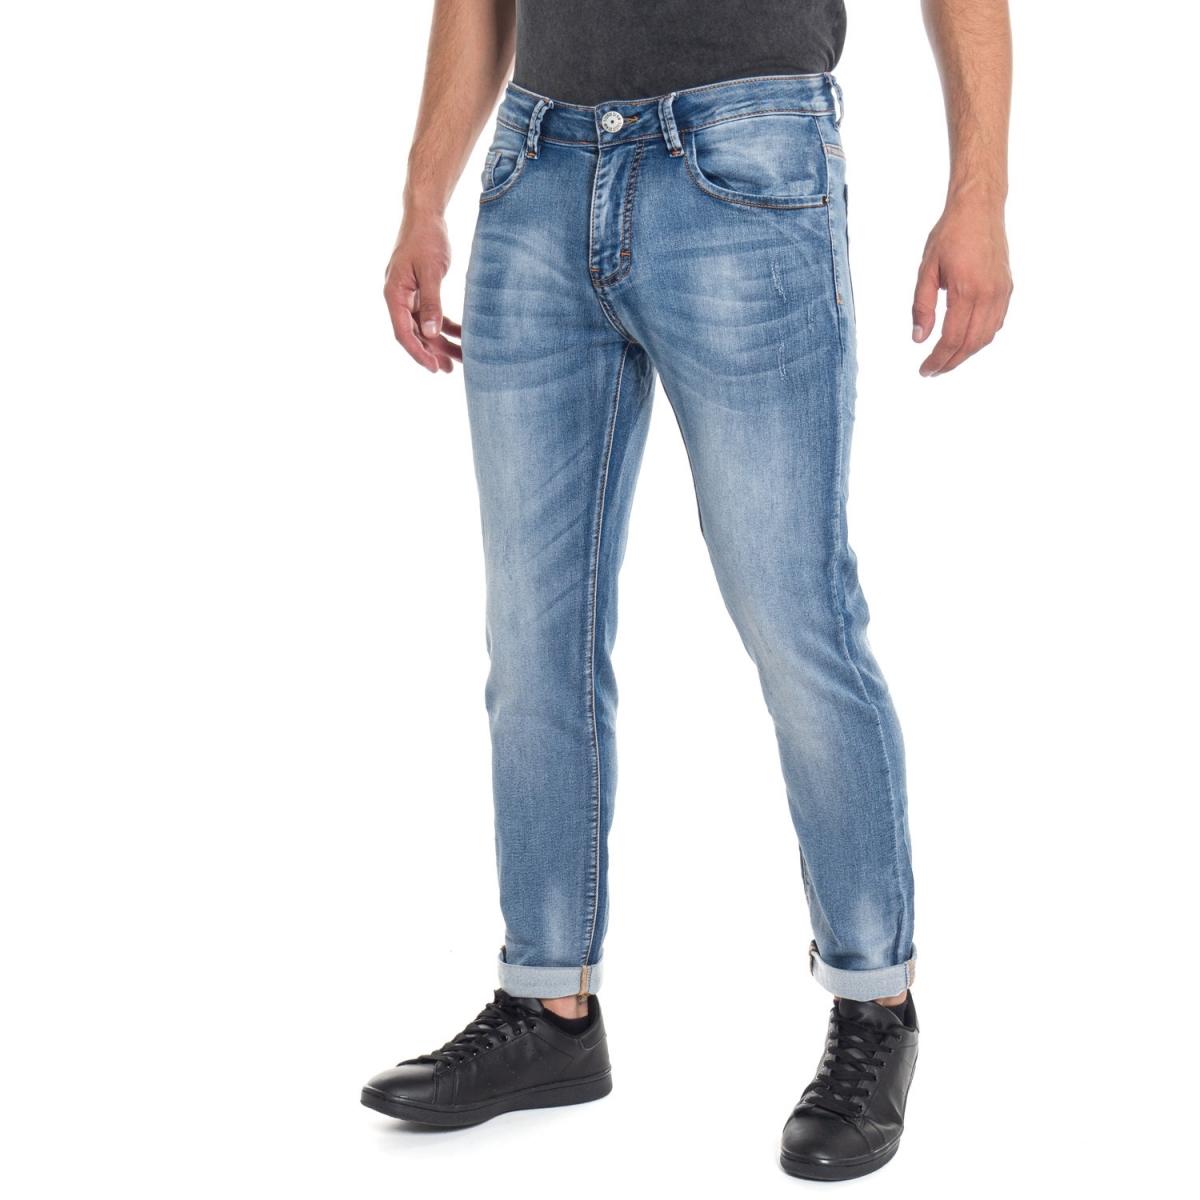 abbigliamento Jeans uomo Jeans slim fitLPHM1095 LANDEK PARK Cafedelmar Shop